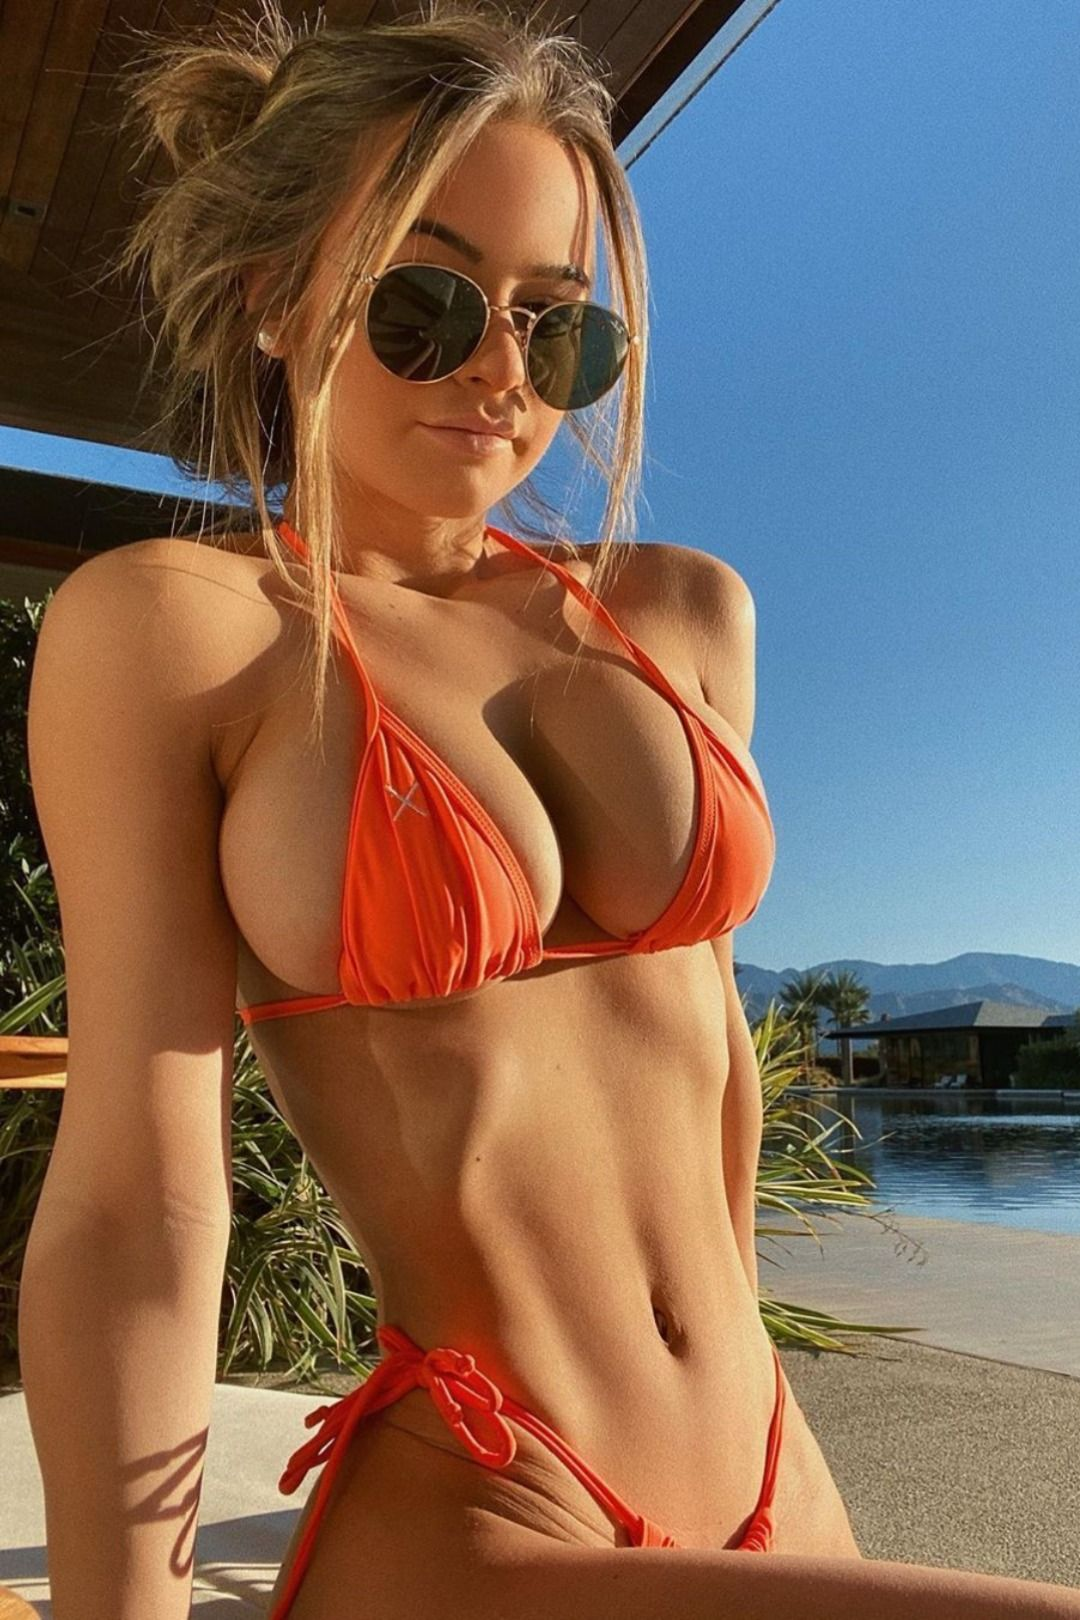 Hot sexy bikini girl photo